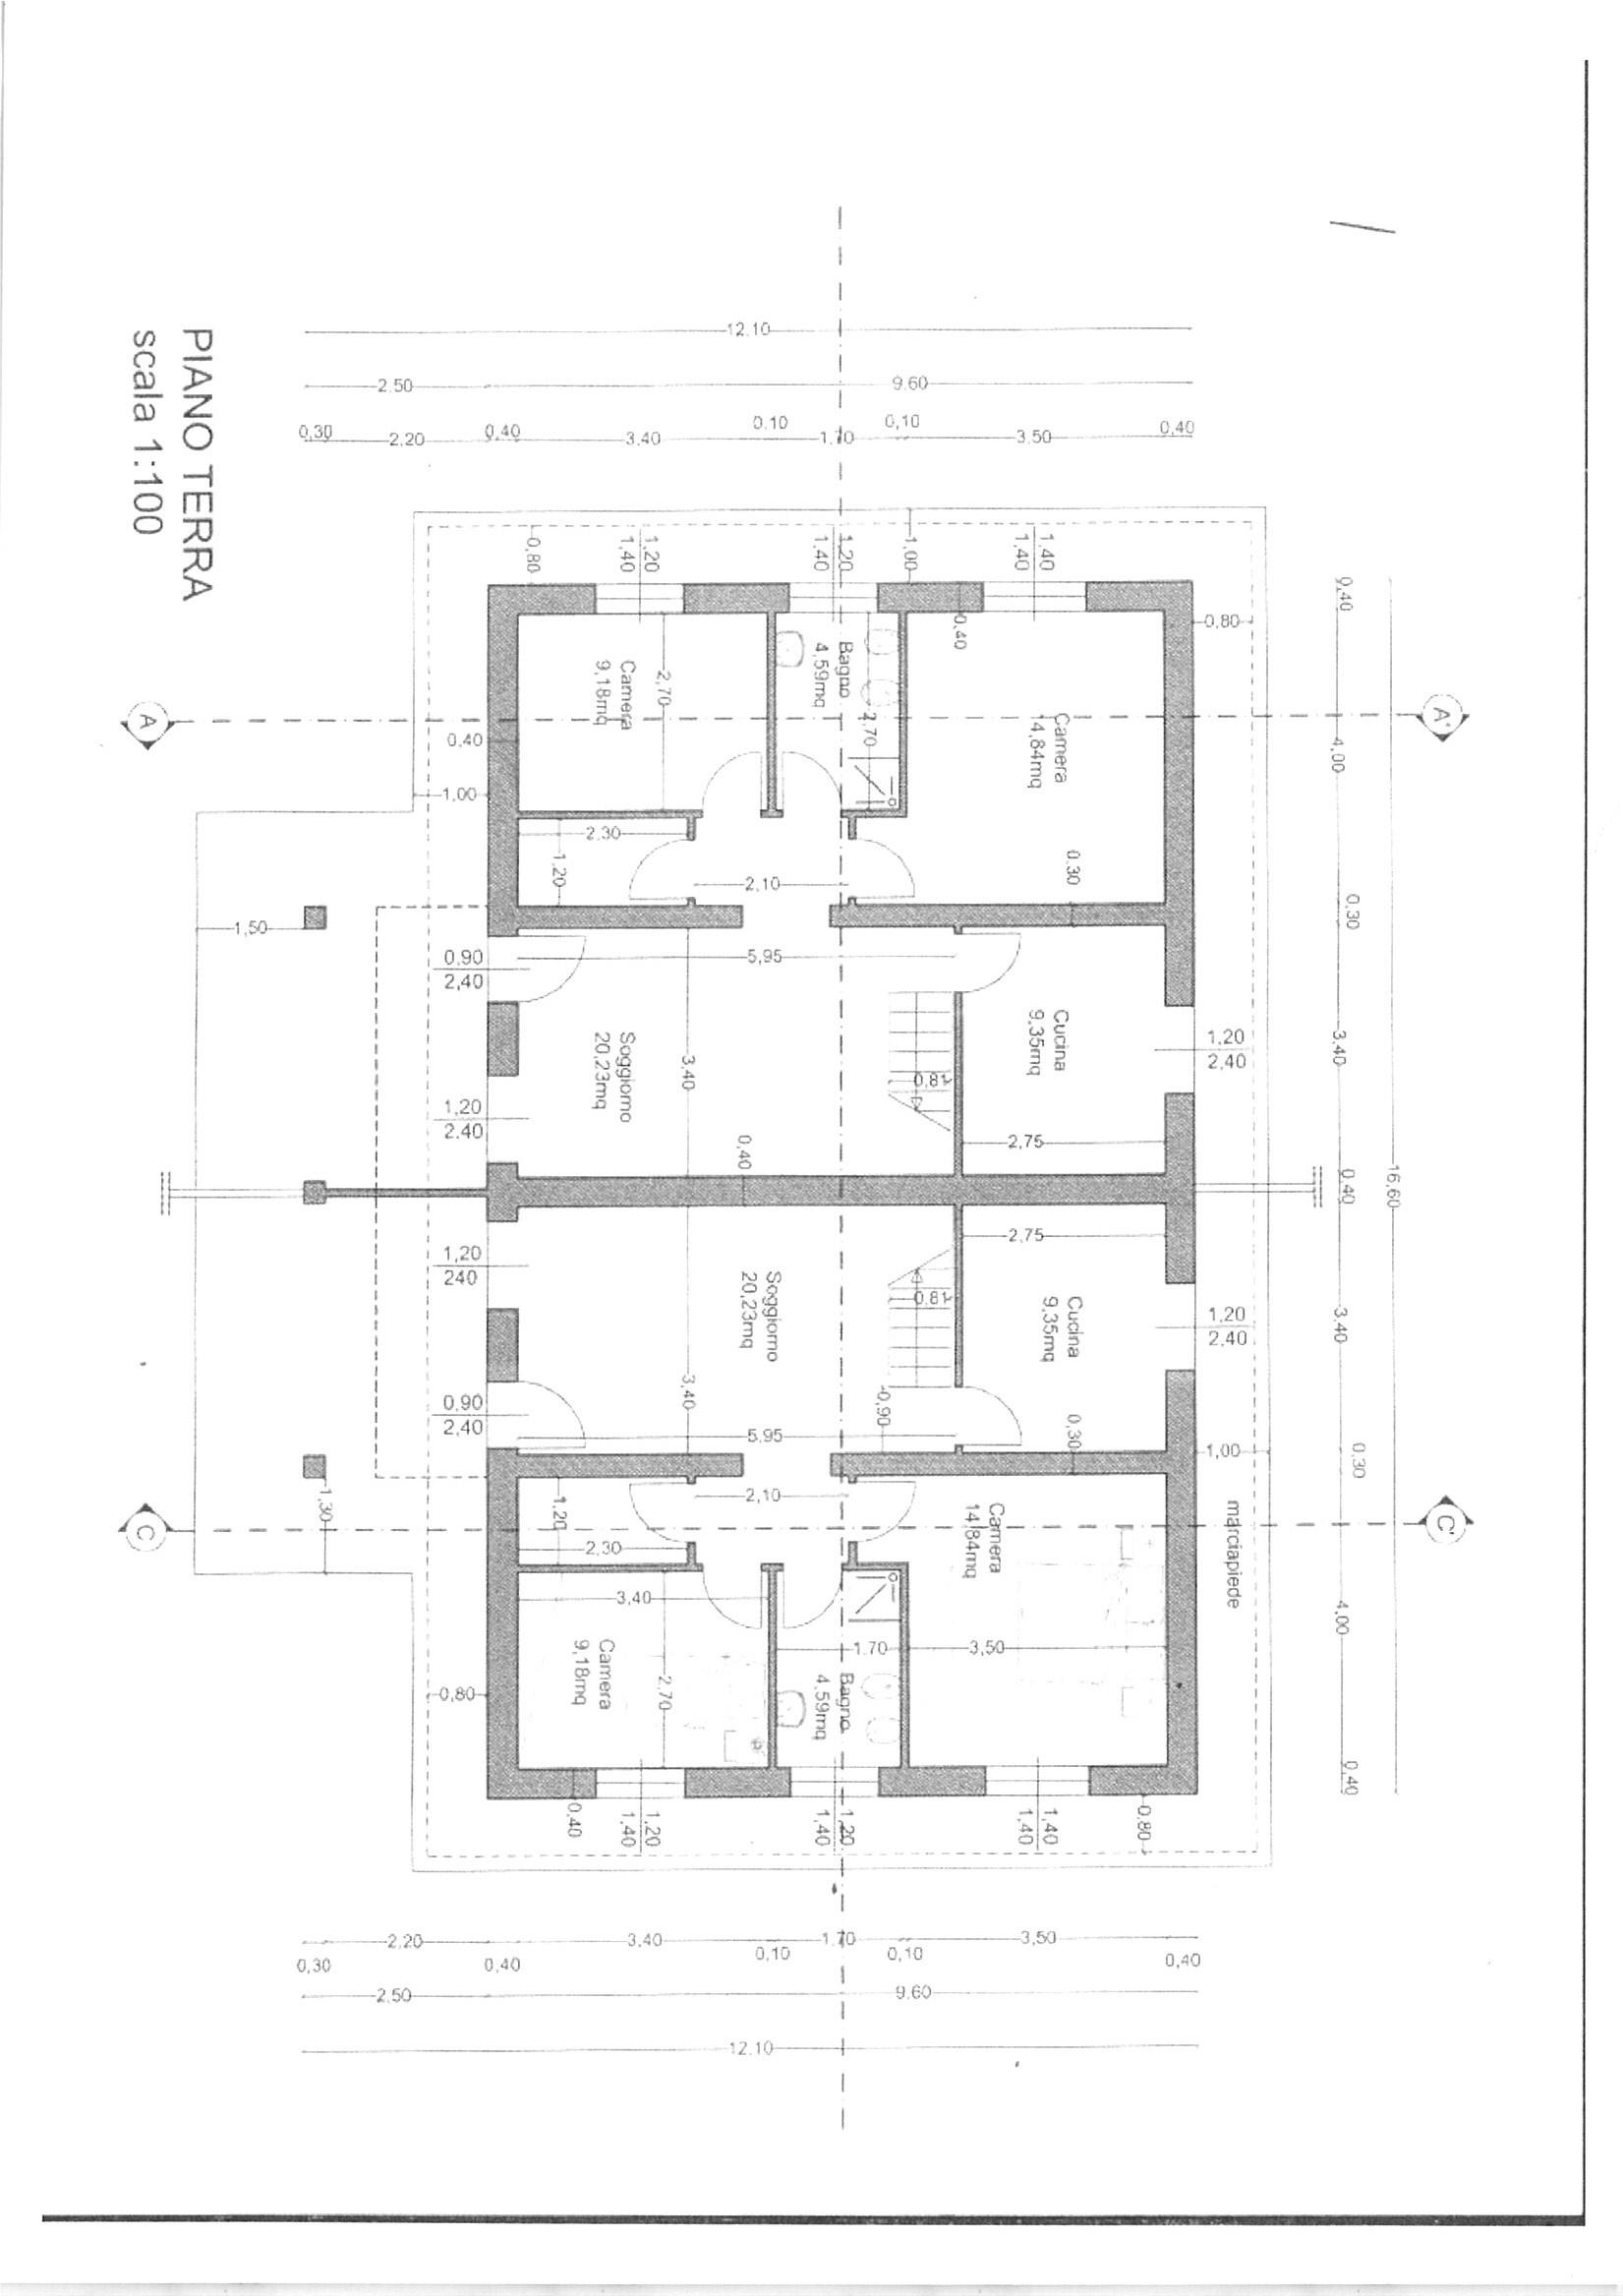 Planimetria 3/5 per rif. vbf lamm 160